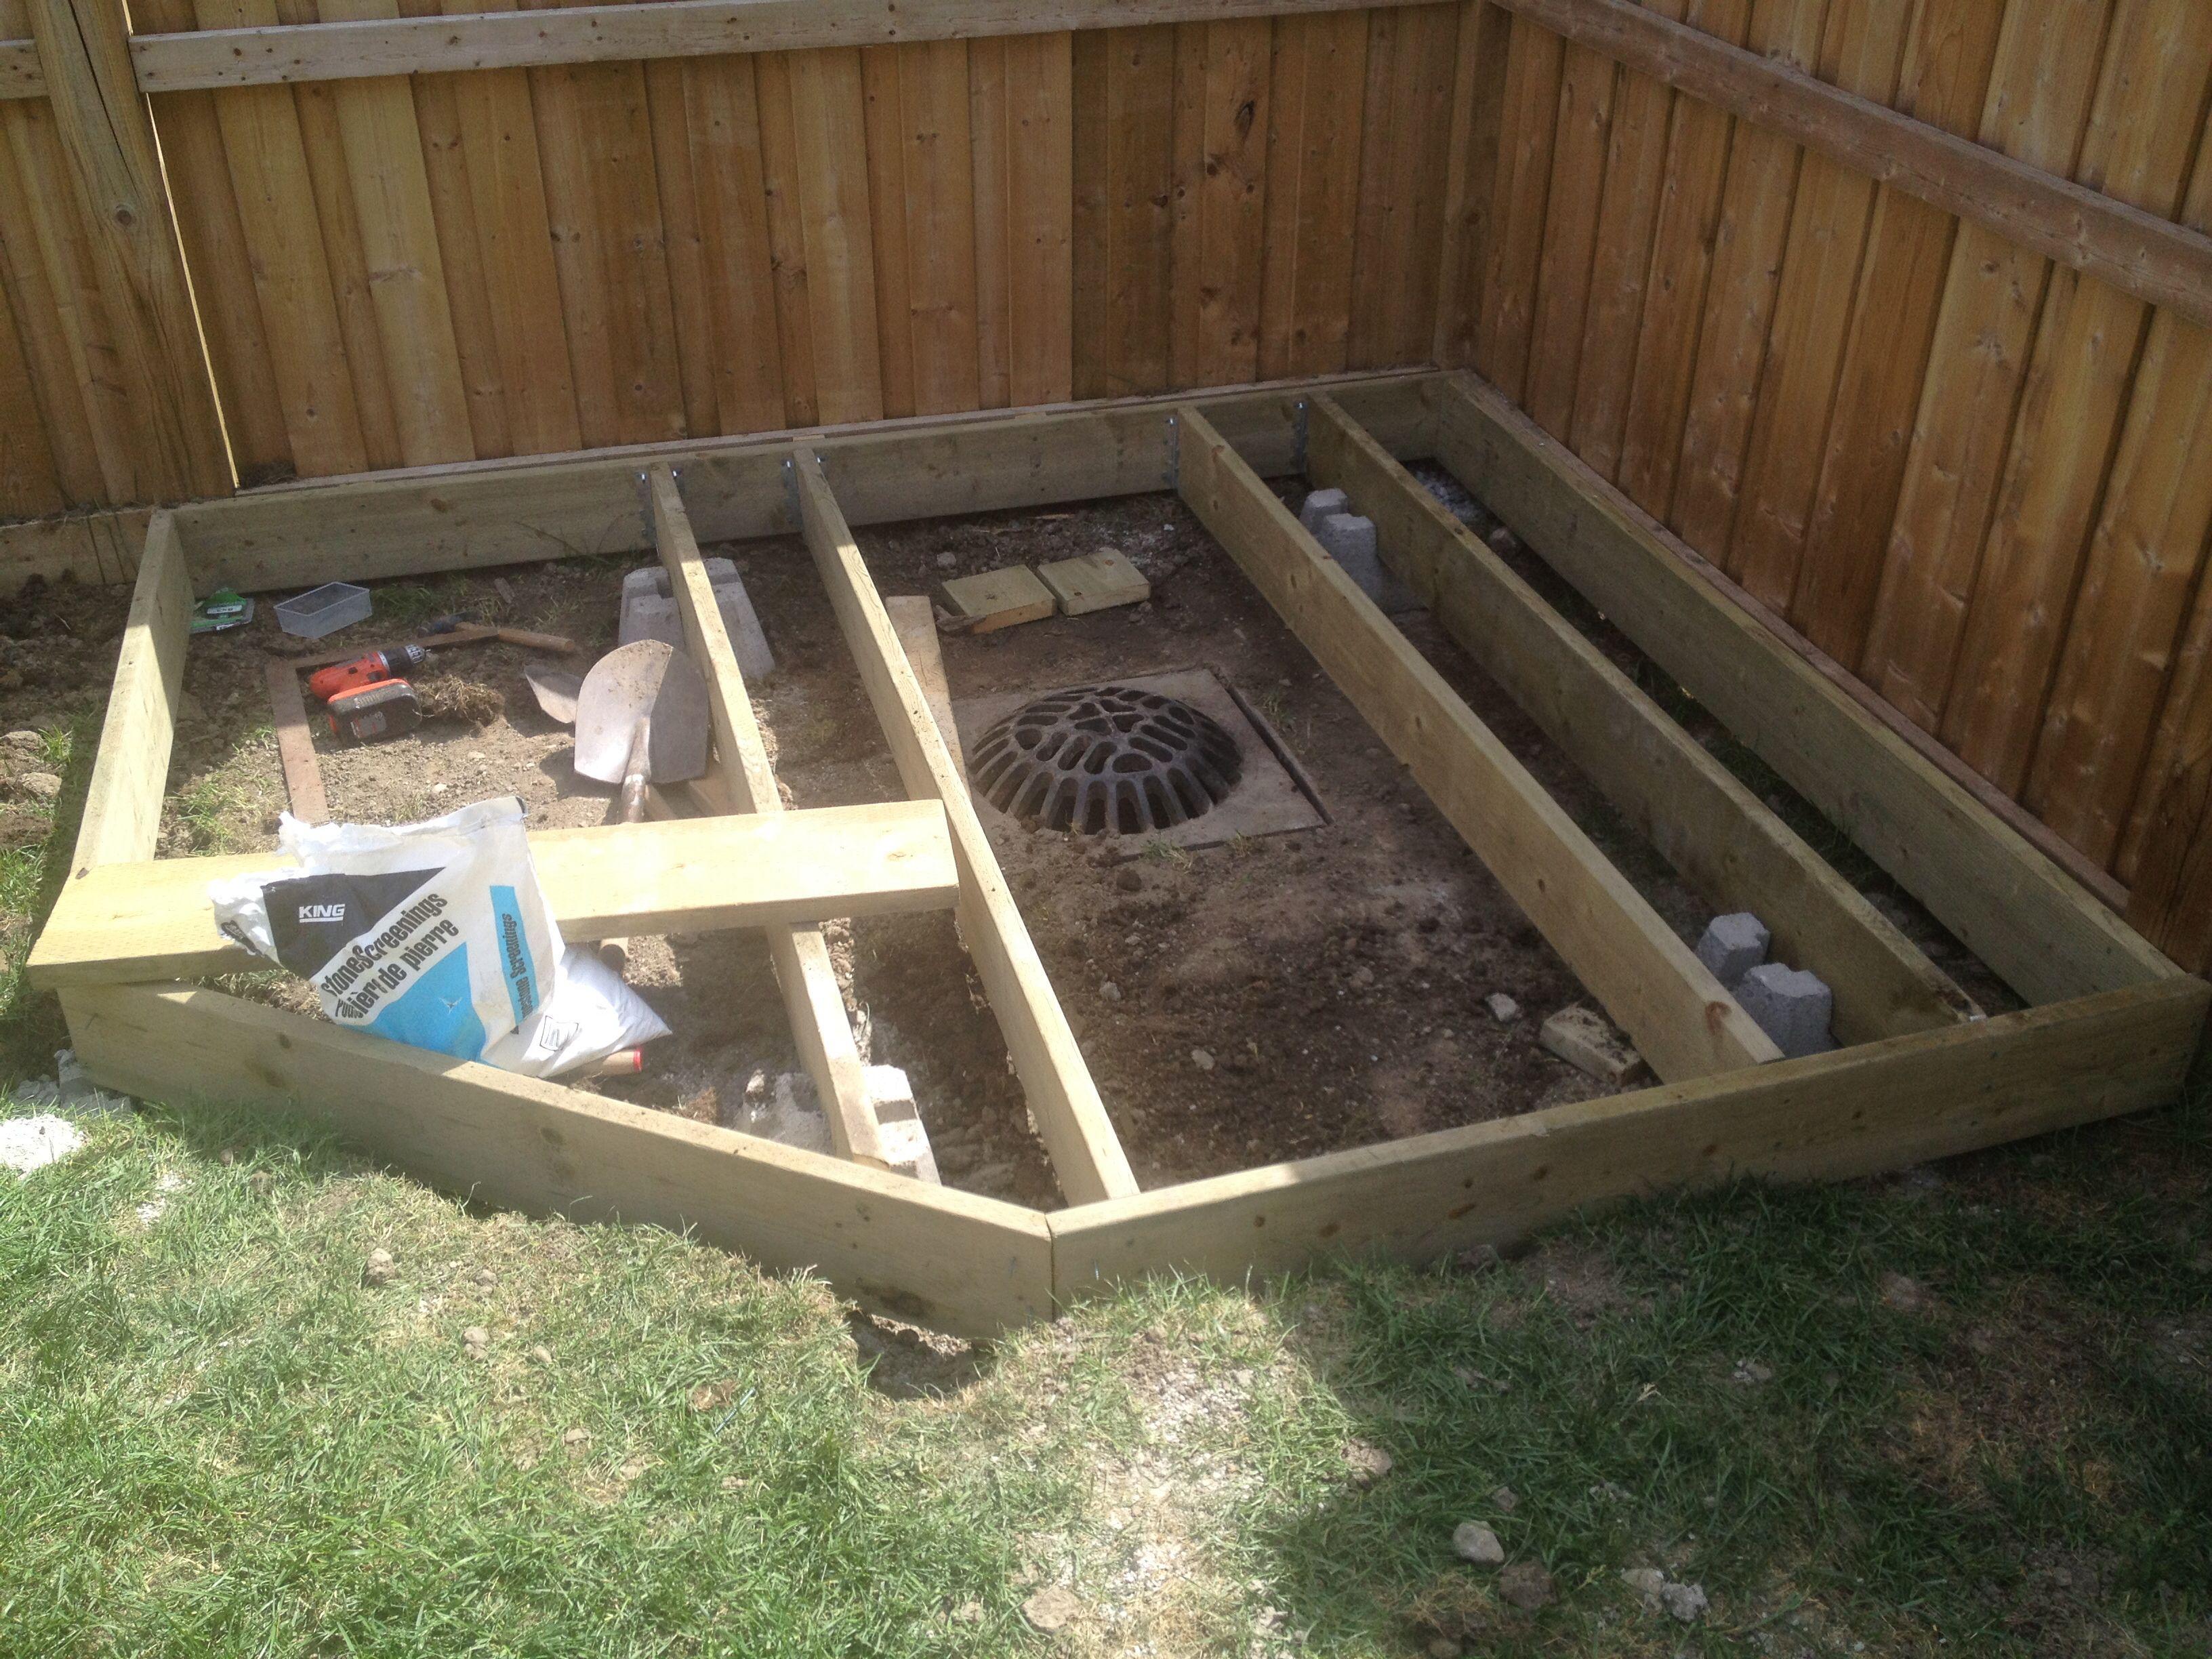 Hiding A Storm Drain Catch Basin Kid Friendly Backyard Backyard Projects Dream Backyard